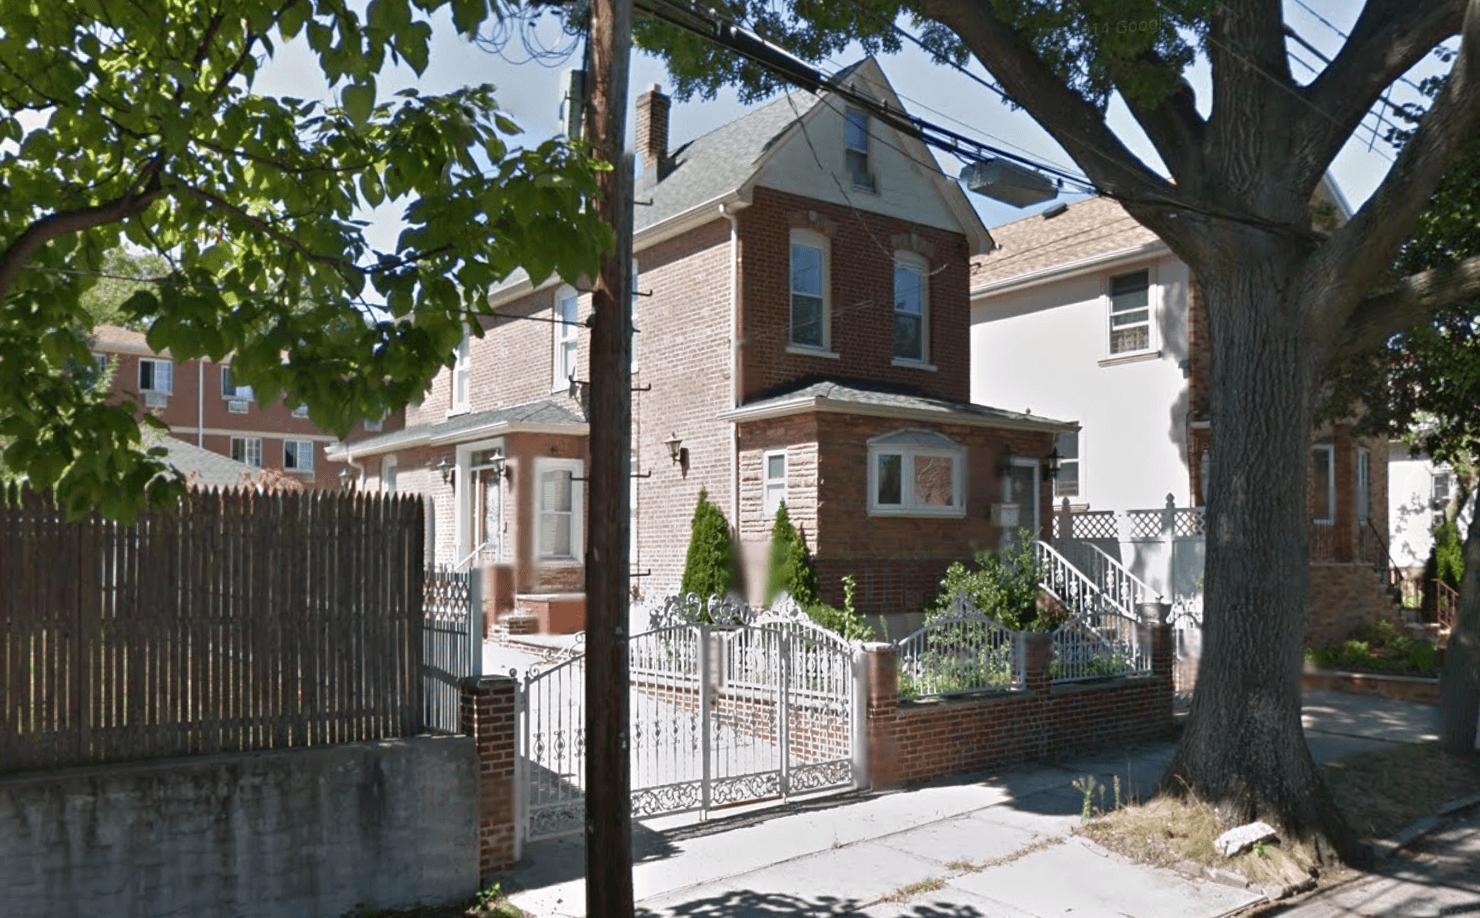 61-42 168th Street